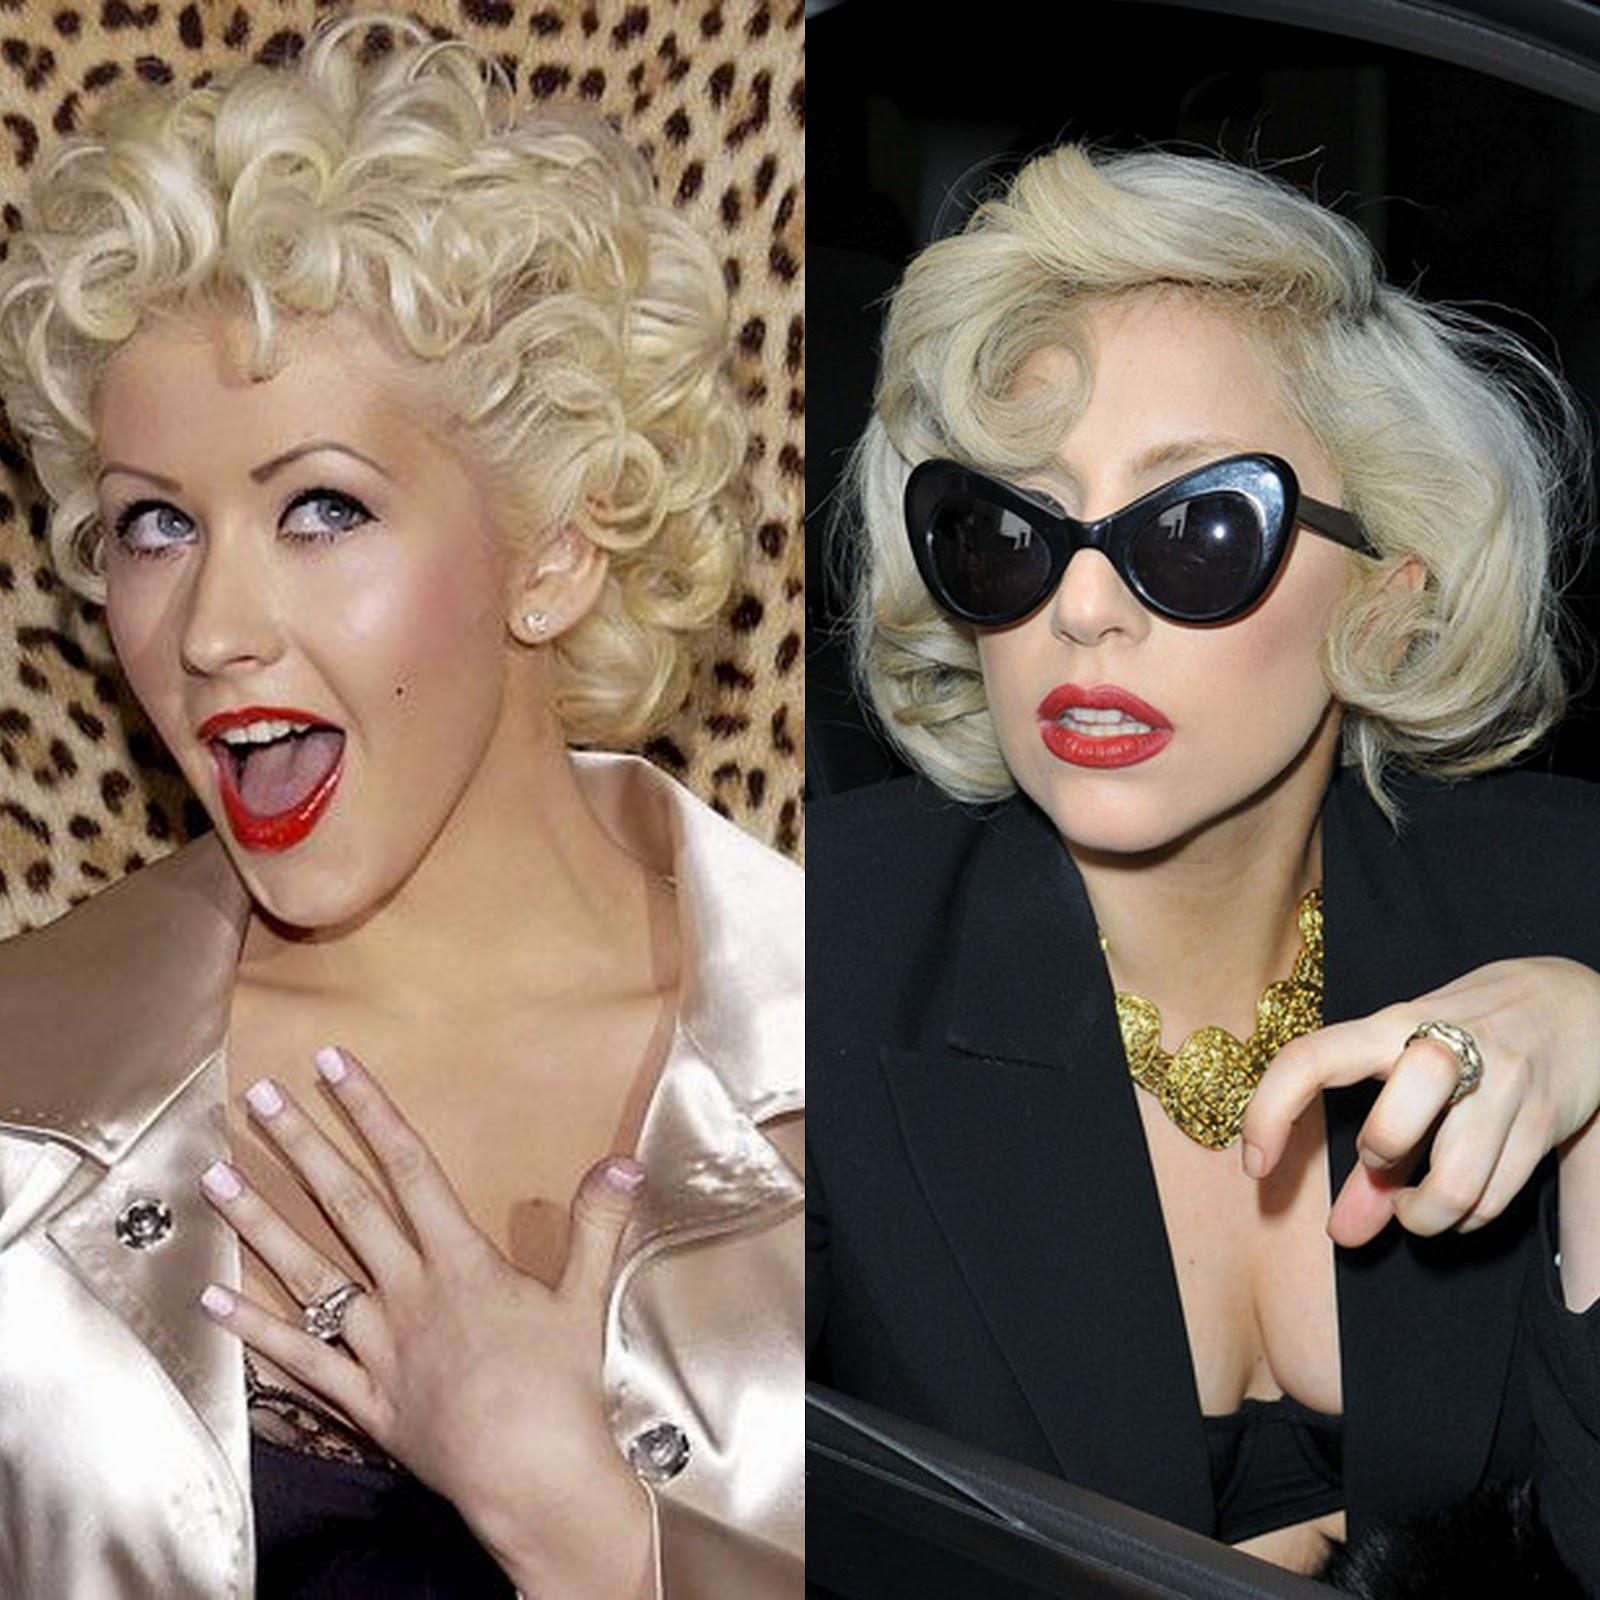 http://2.bp.blogspot.com/-uMdNunKh9HM/T8gIwtbjUvI/AAAAAAAAAzg/nsfVLR0UMsw/s1600/Christina+Aguilera+e+Lady+Gaga.jpg